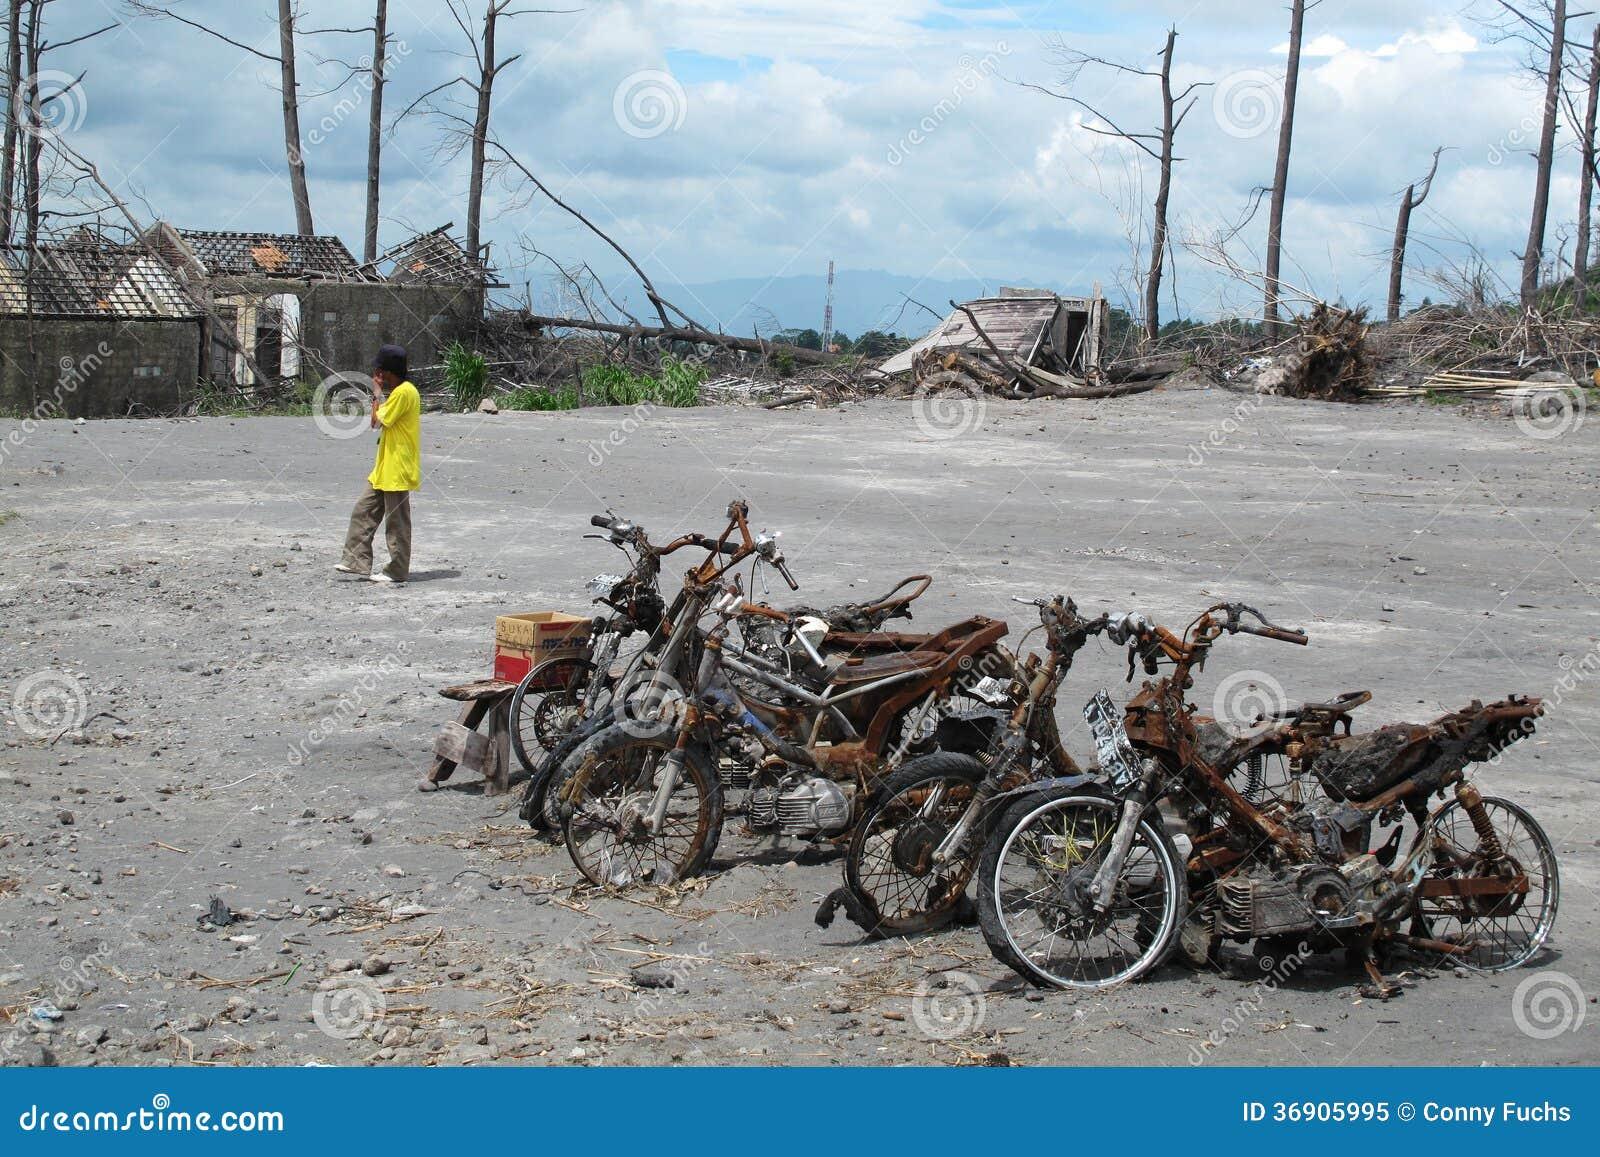 Burnt motocykli/lów wraki po wulkan erupci